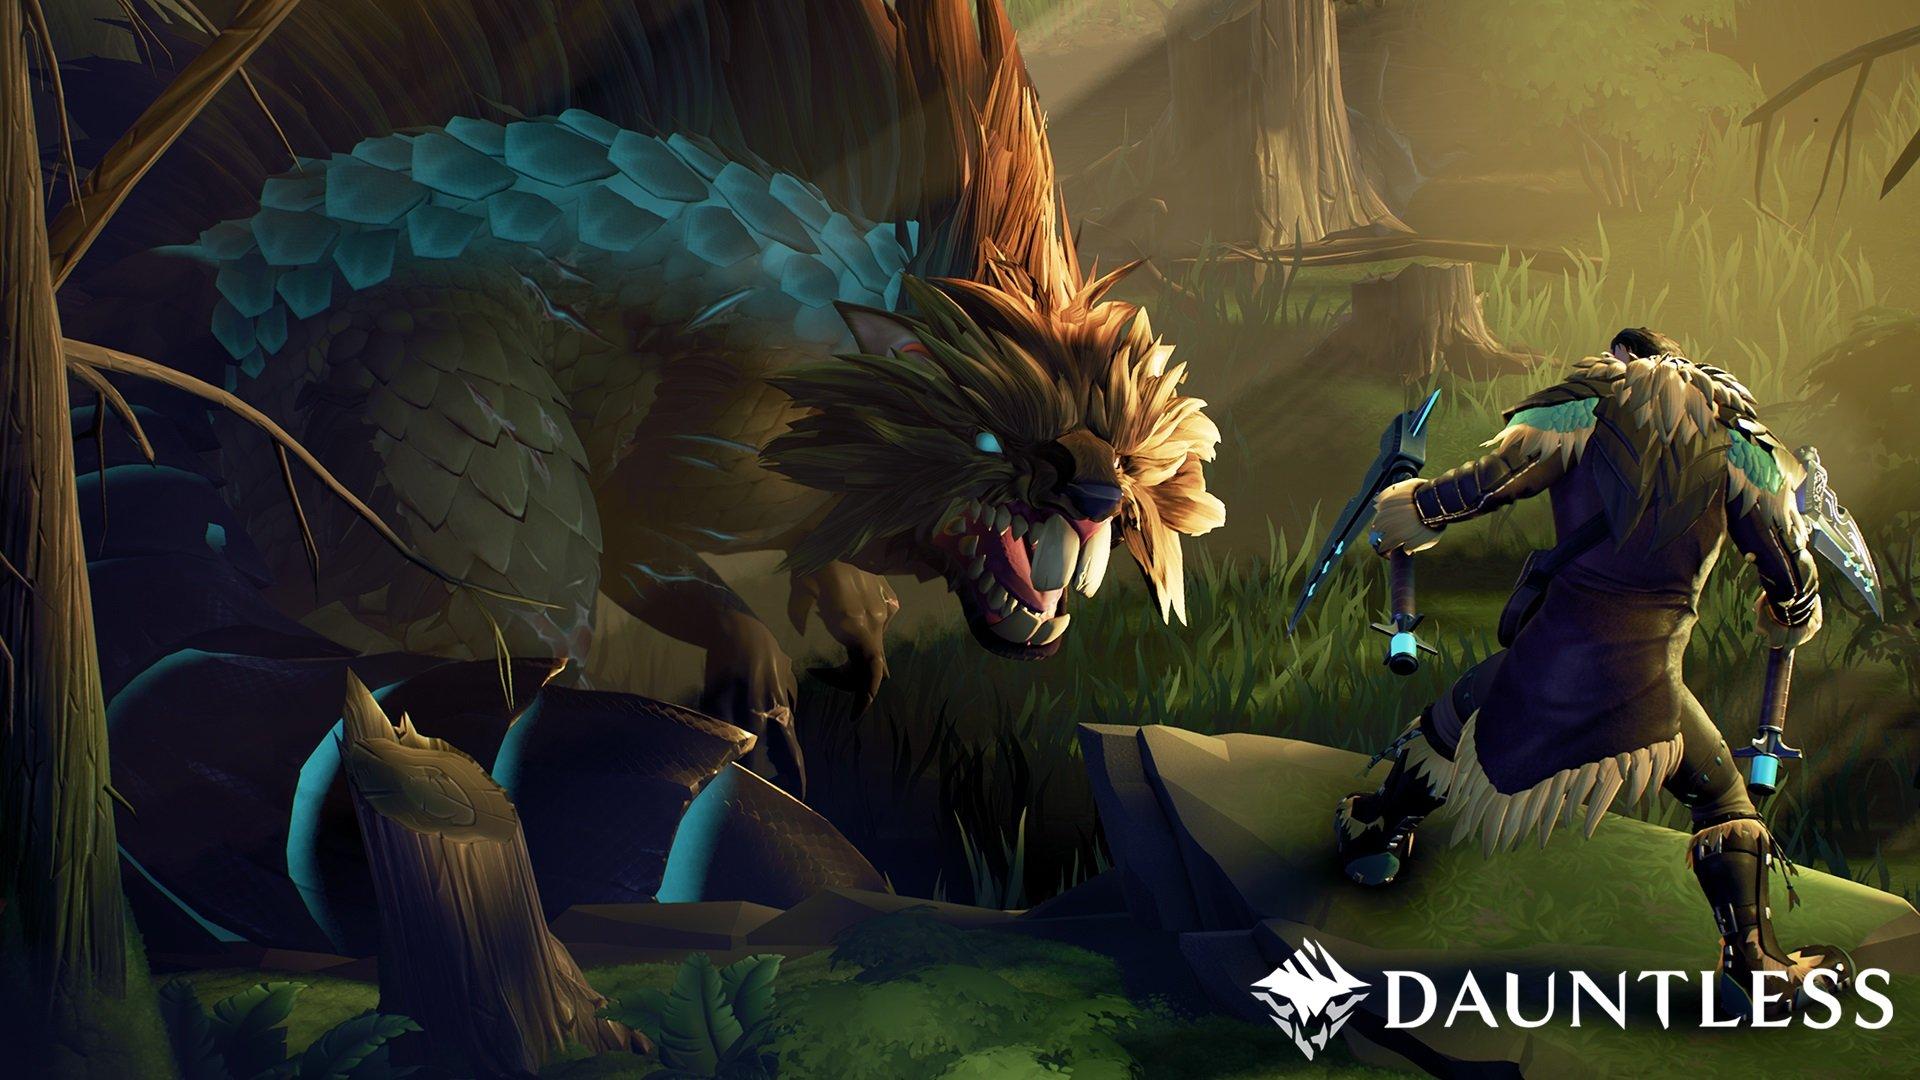 migliori free to play 2019 migliori giochi free to play 2019 MMO gratis Dauntless open beta